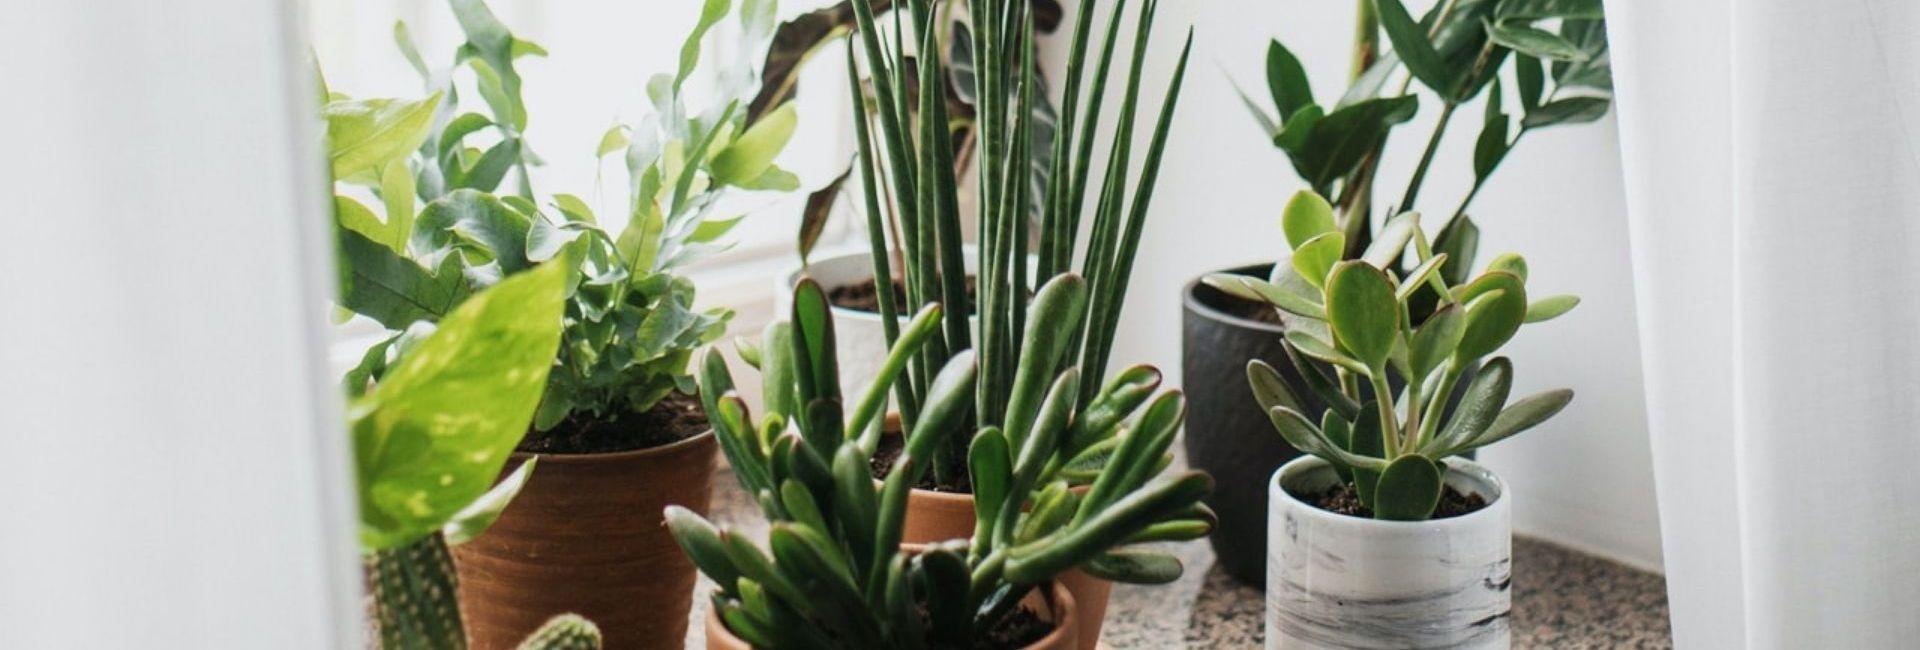 plantes-bord-fenetre